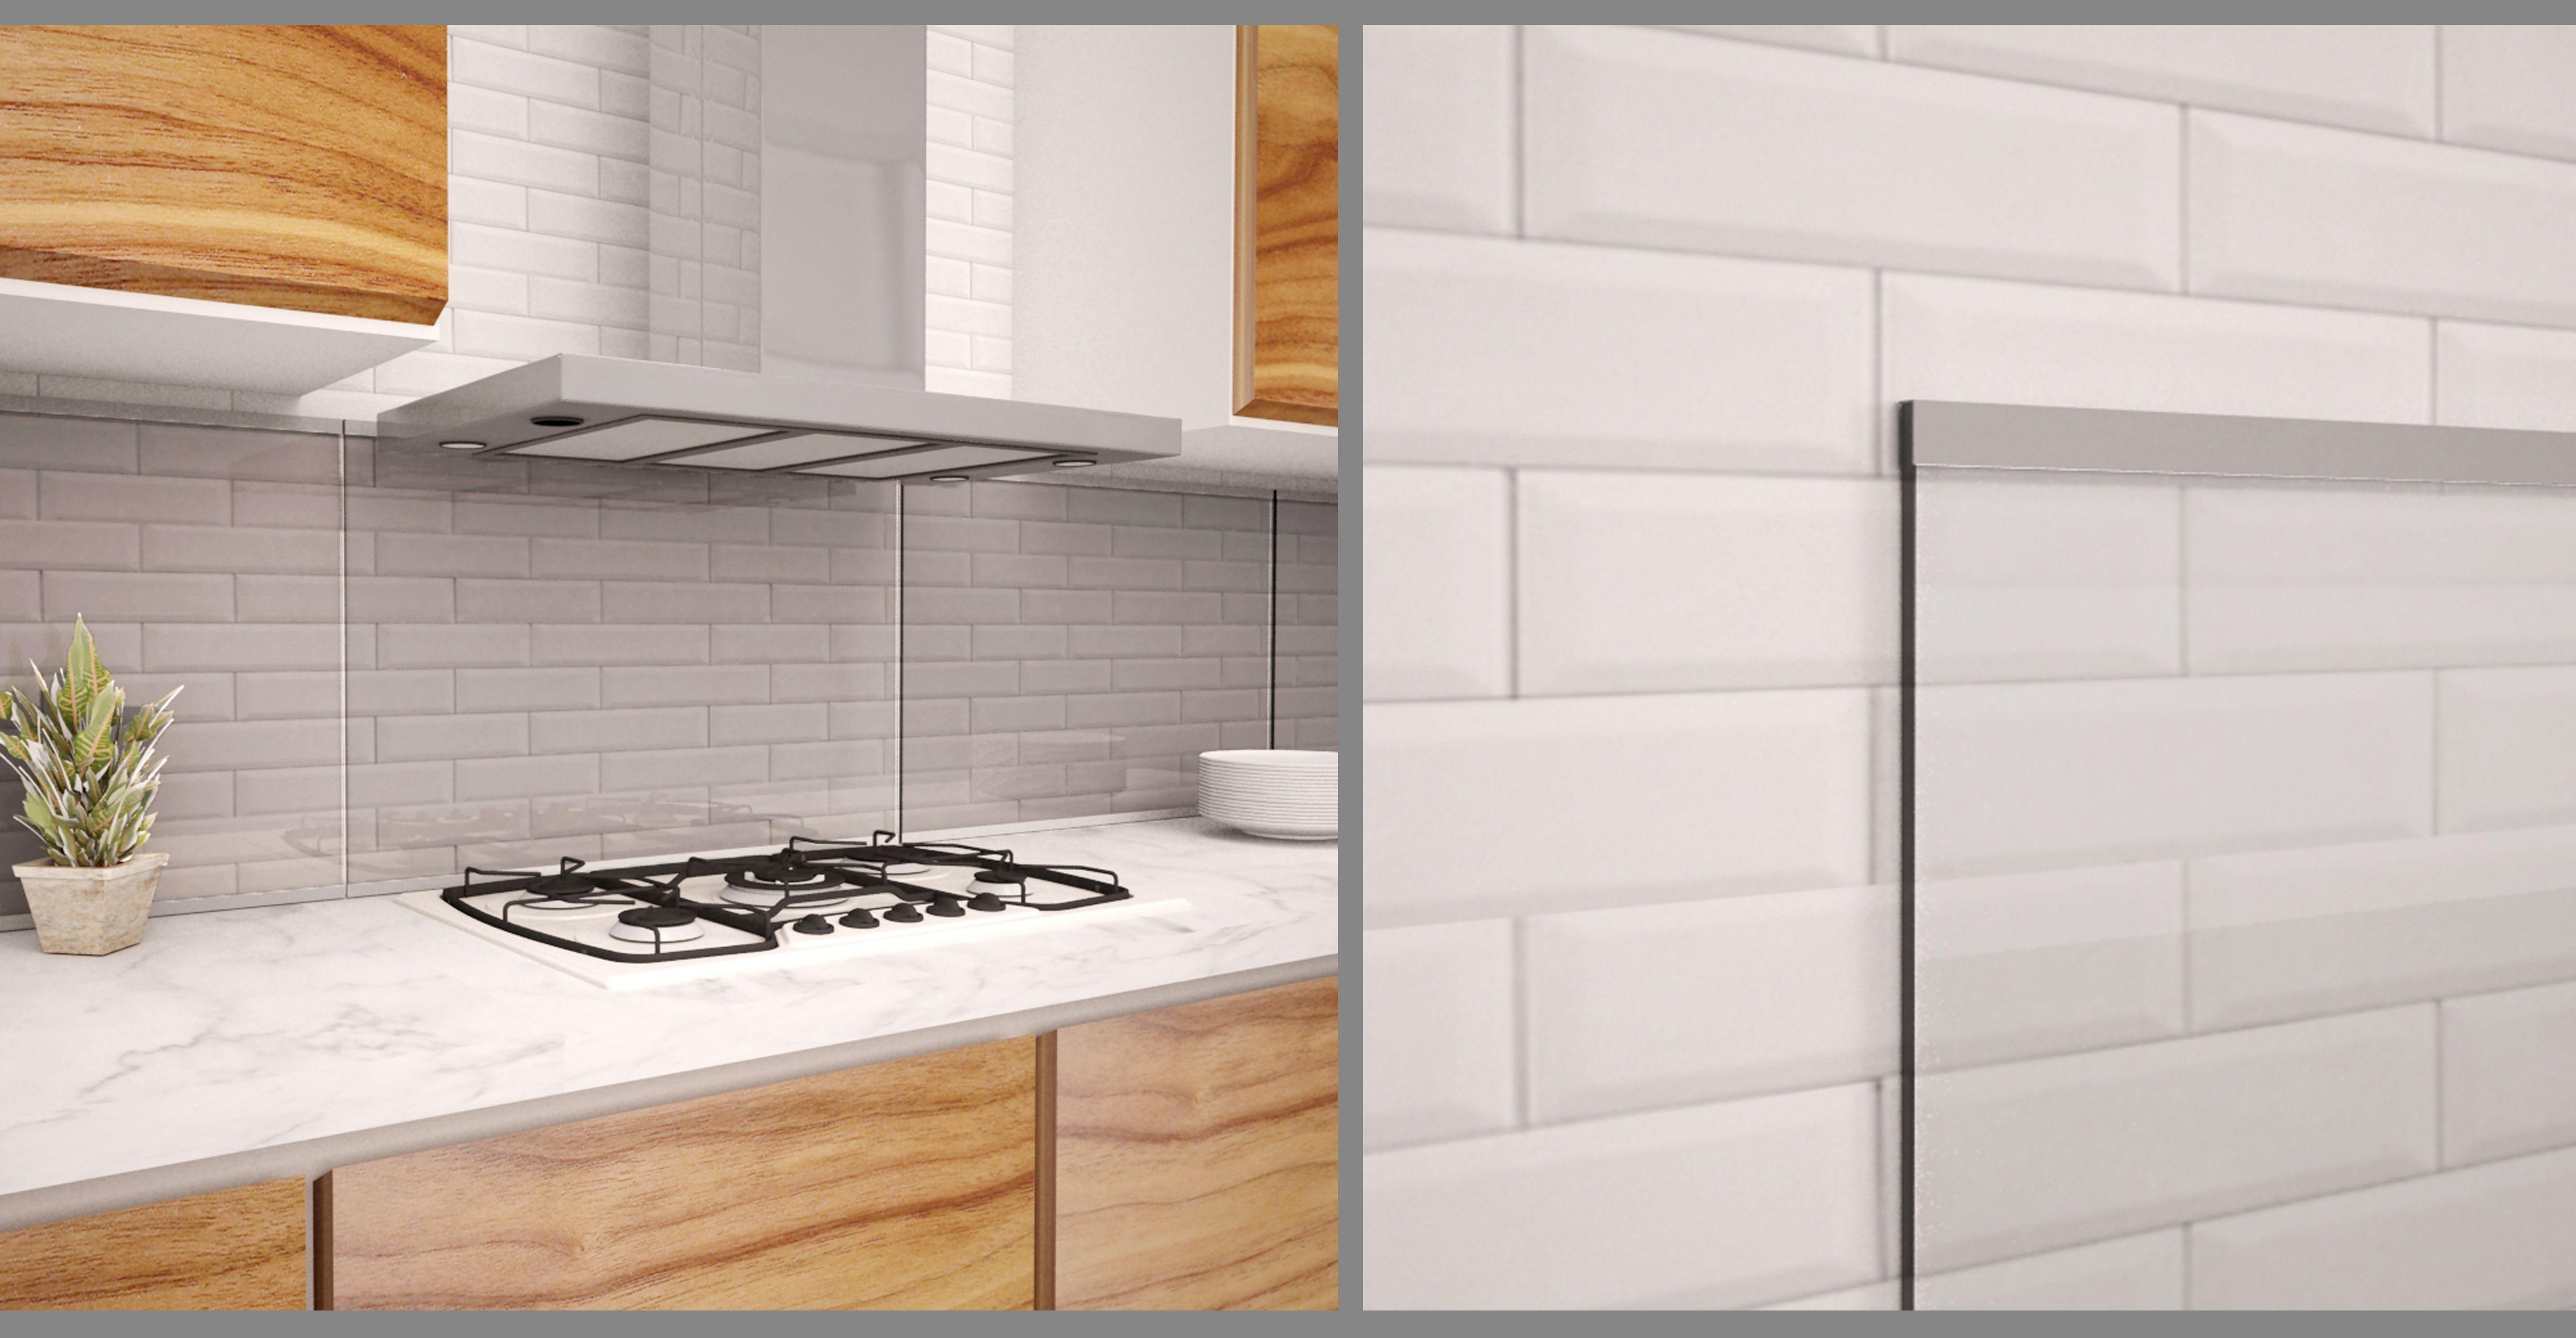 Glass Backsplash With Aluminum Trim Glass Backsplash Modern Backsplash Glass Cabinet Doors